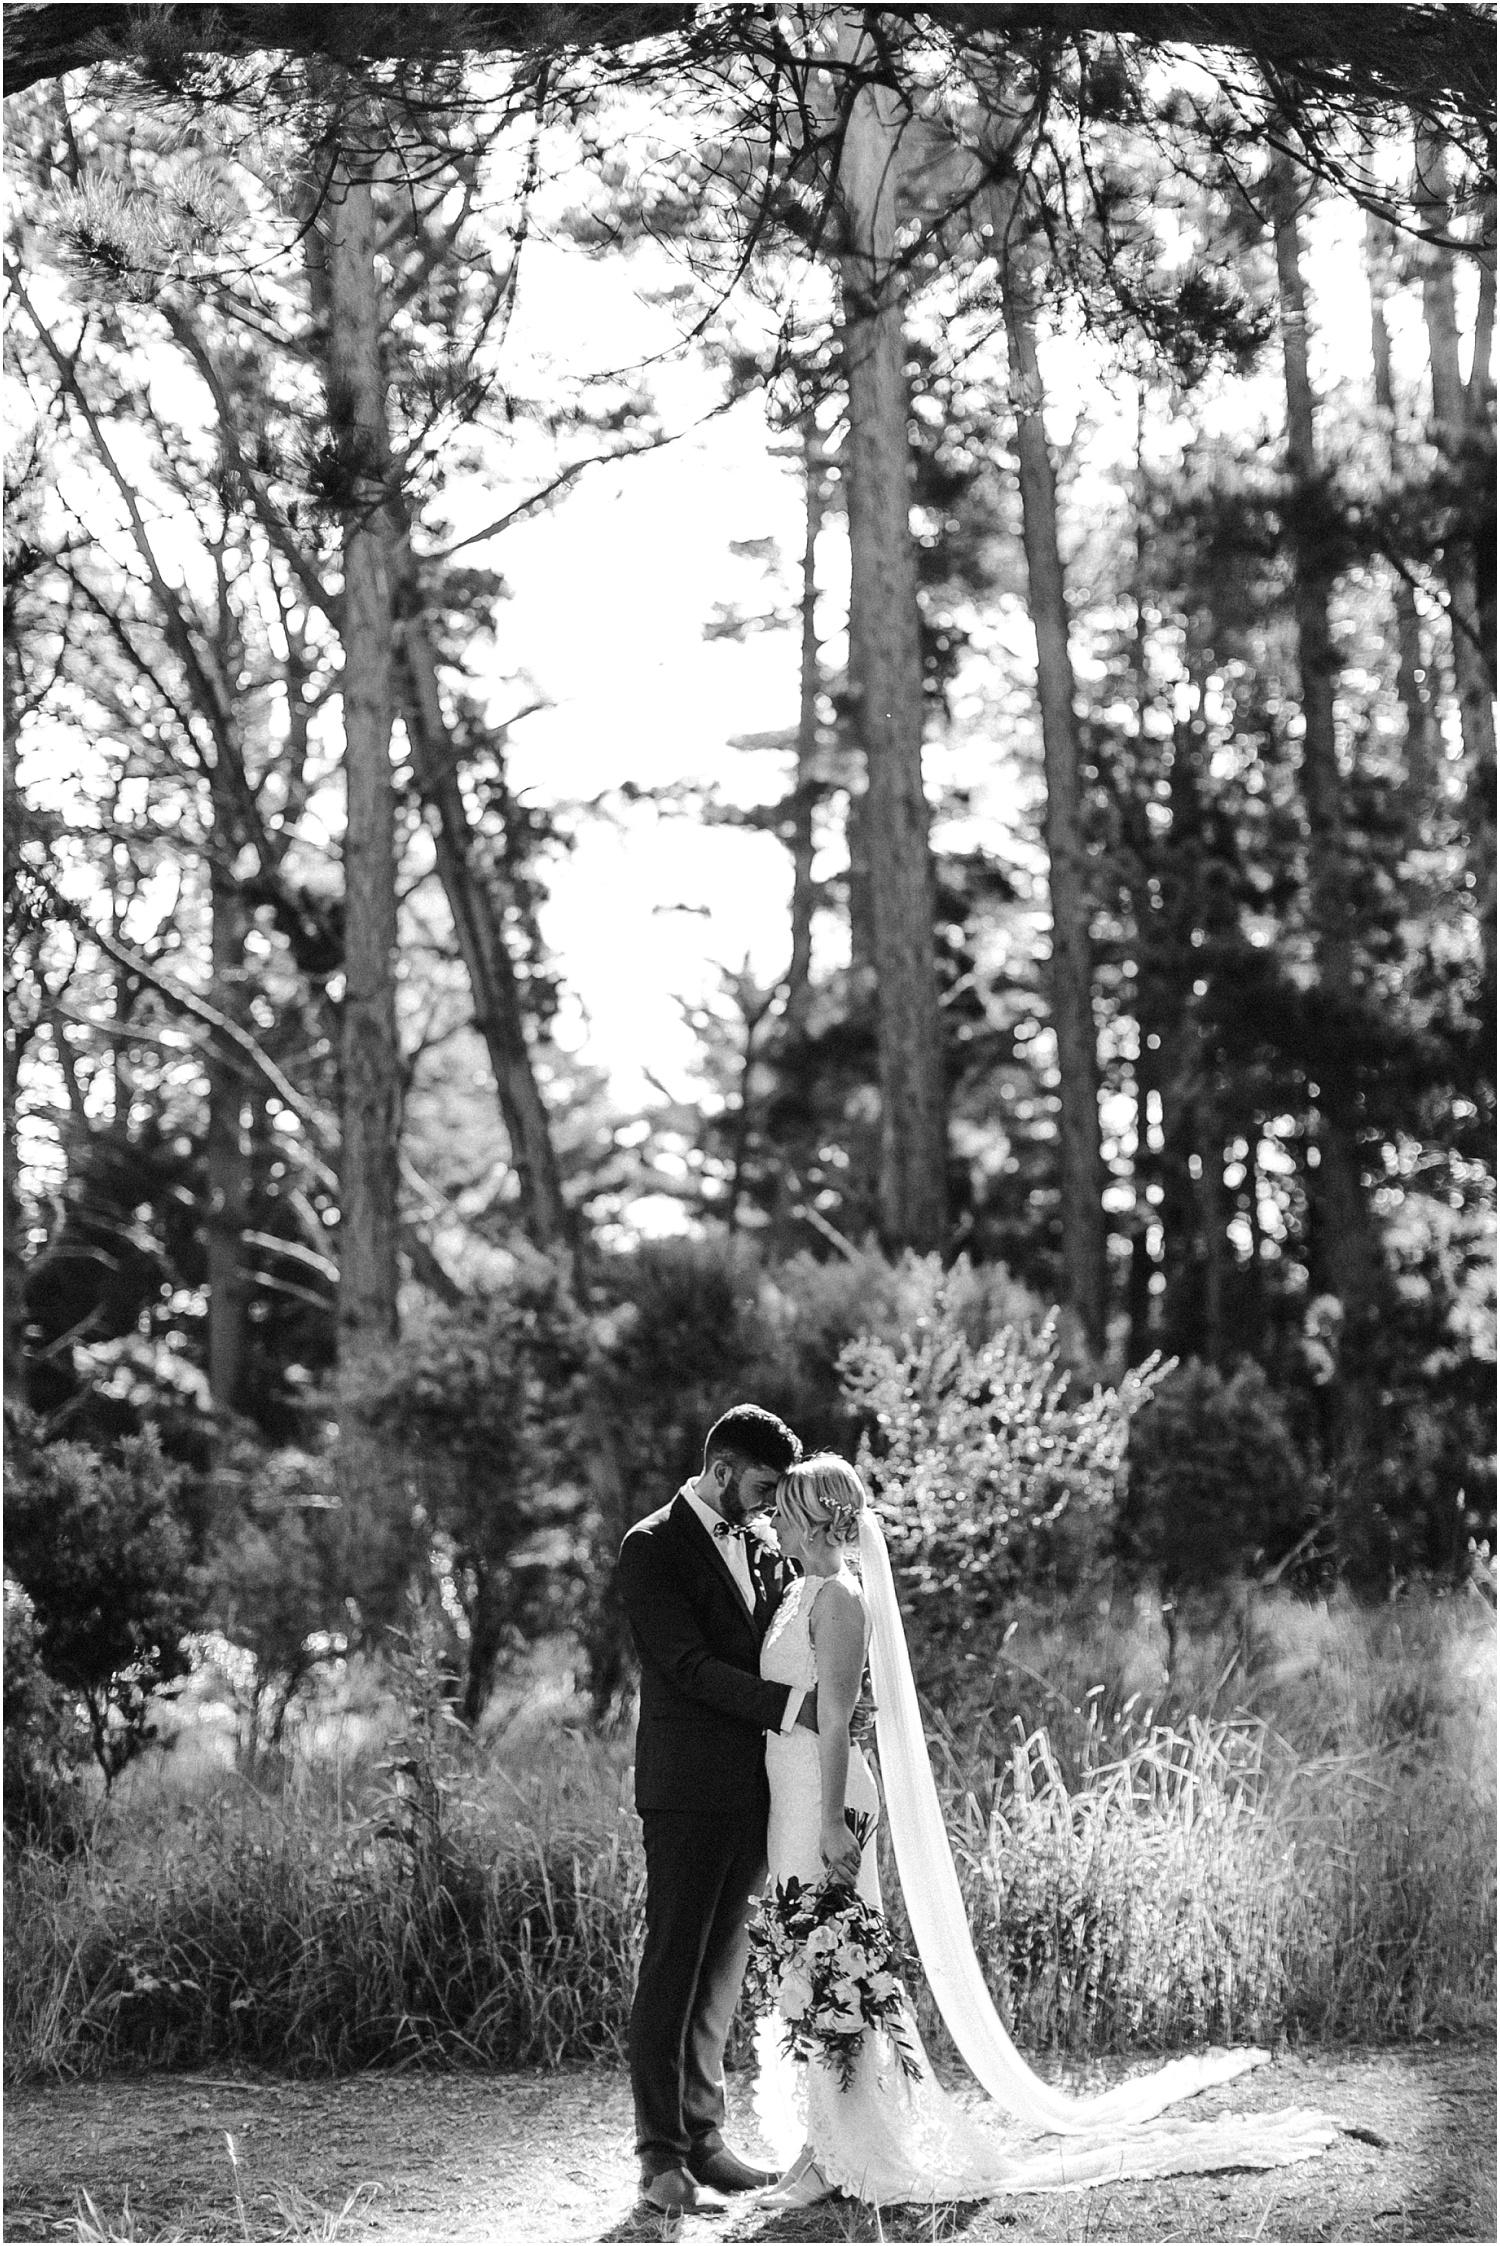 Nicolle and Damien's tipi wedding at the Flinders Yacht Club on the Mornington Peninsula._0131.jpg